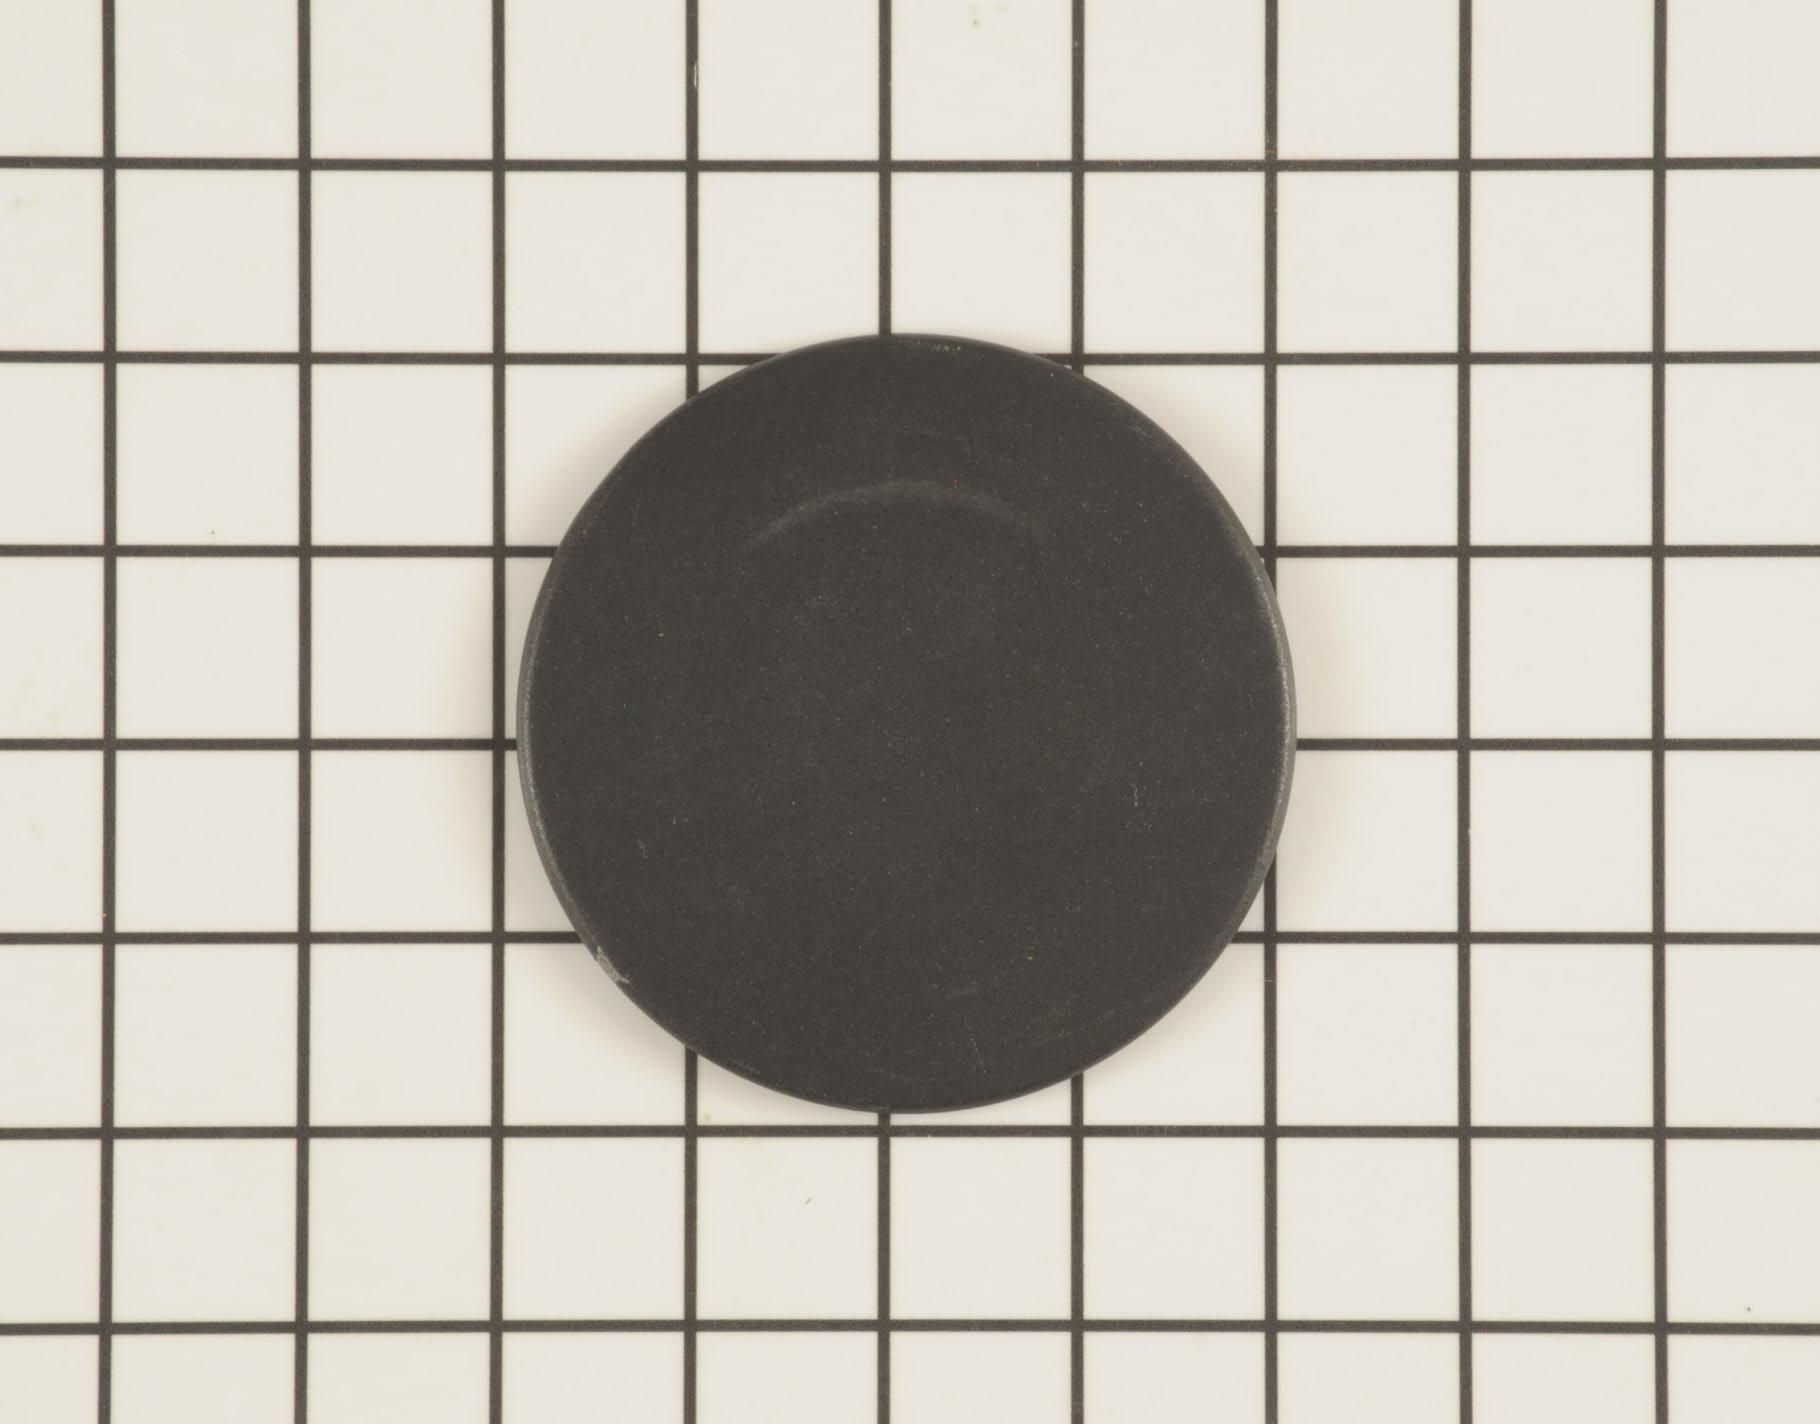 Whirlpool Range/Stove/Oven Part # WP8286818 - Surface Burner Cap